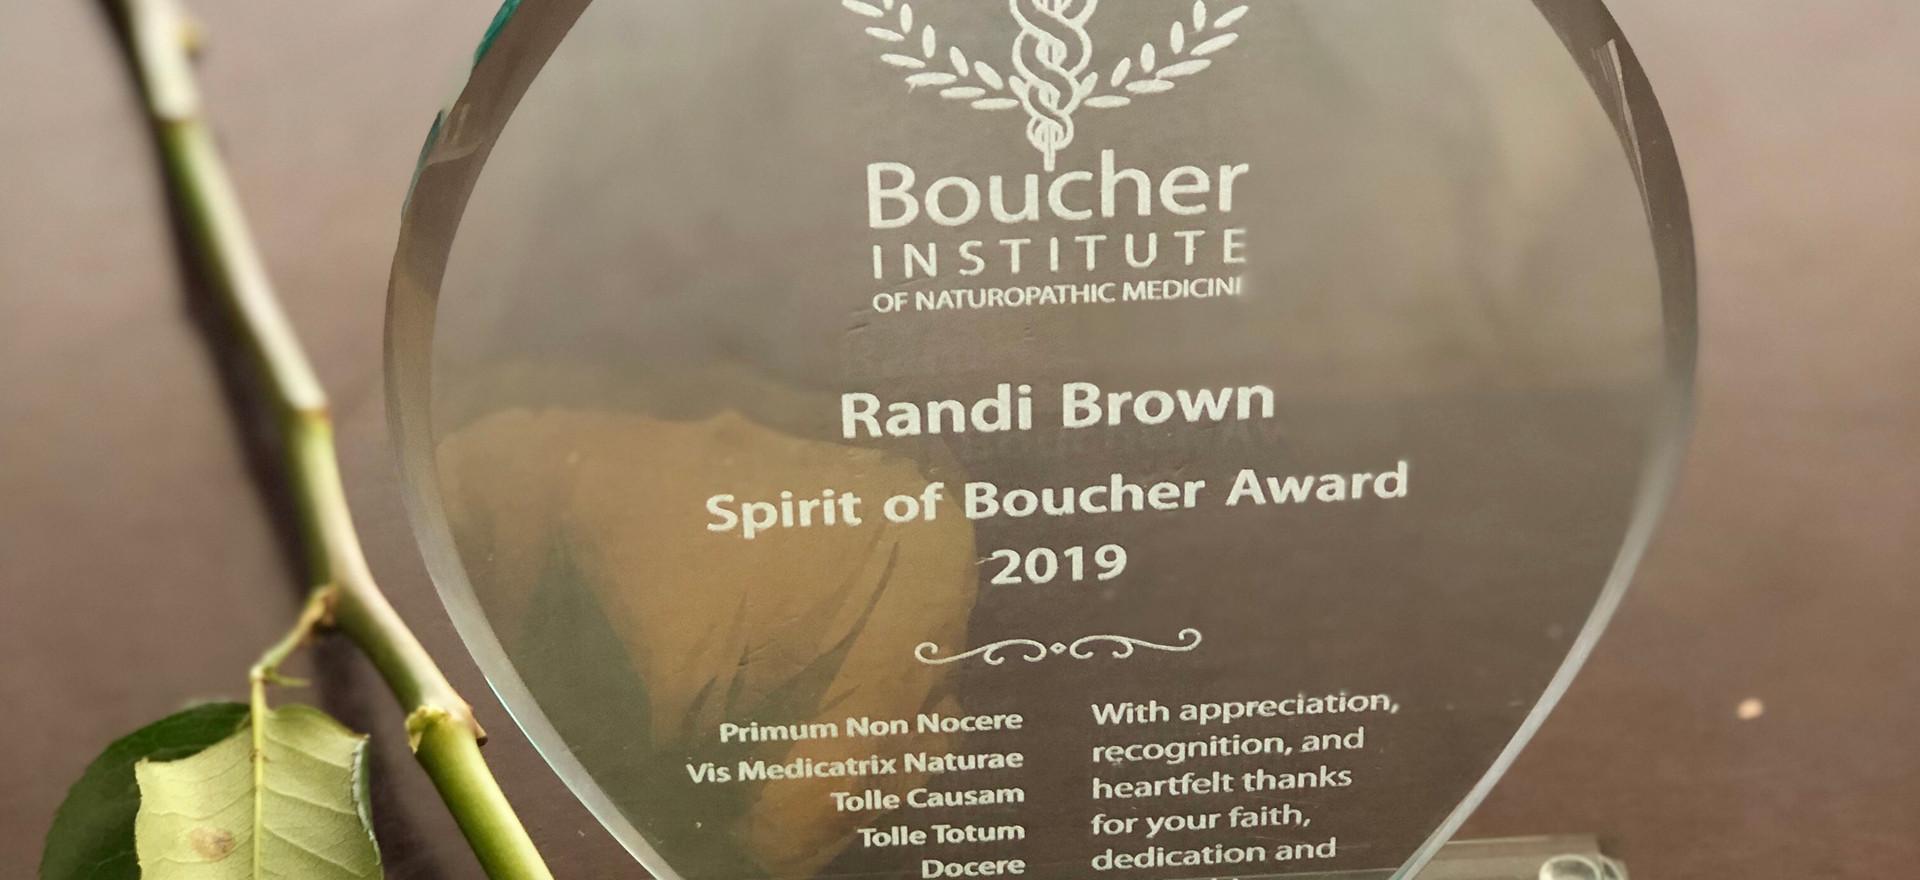 Spirit of Boucher Award